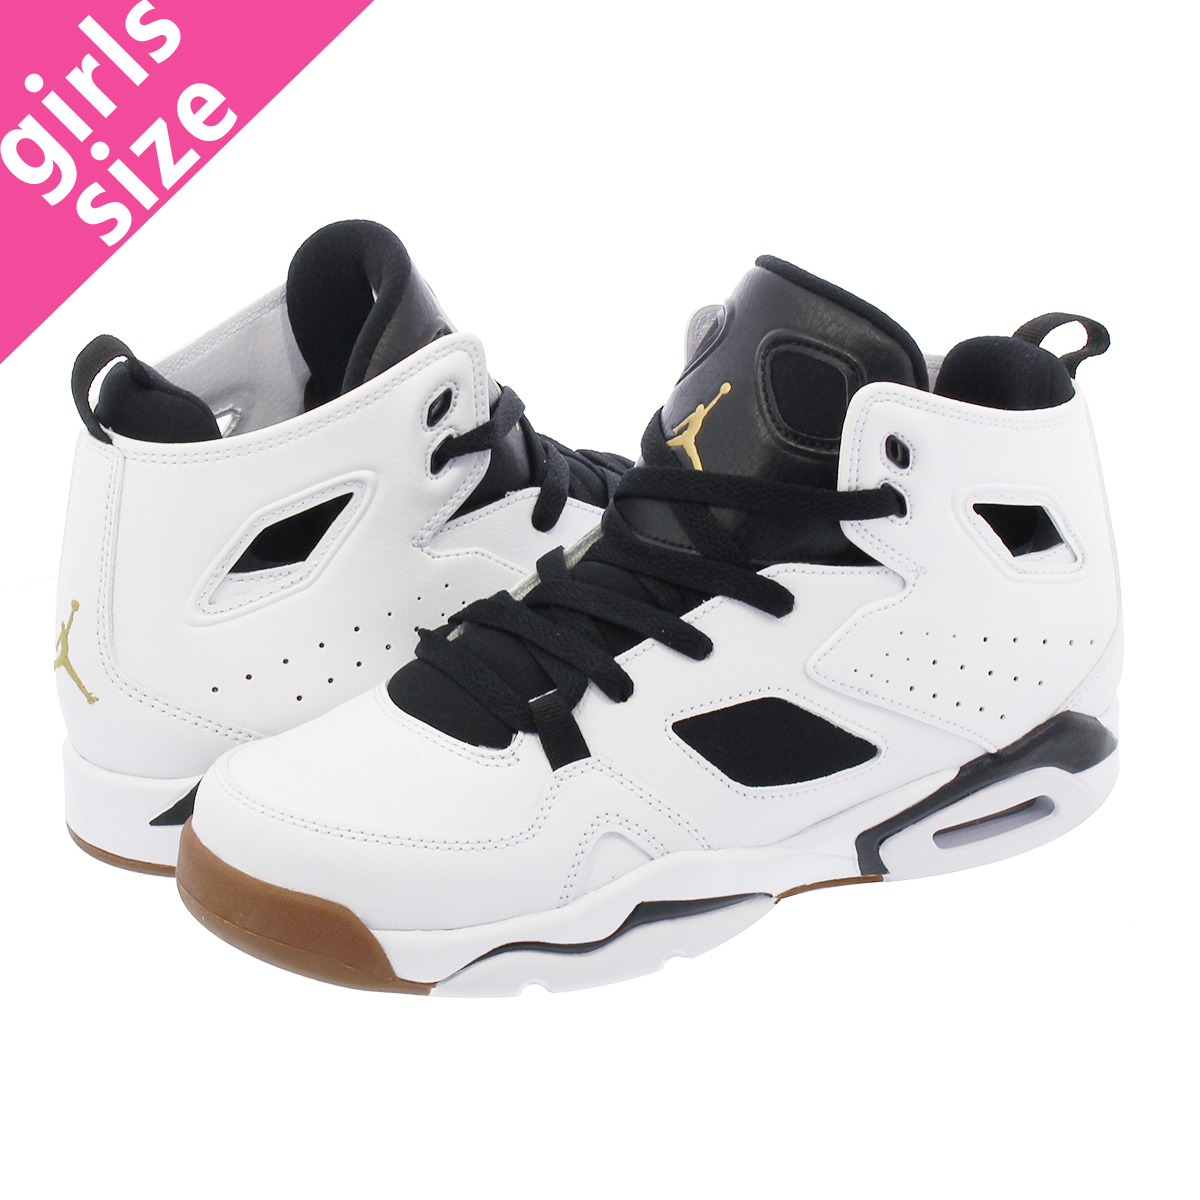 NIKE JORDAN FLIGHT CLUB 91 GG Nike Jordan flight club 91 GG WHITE BLACK GOLD  555 a4945304e8b5